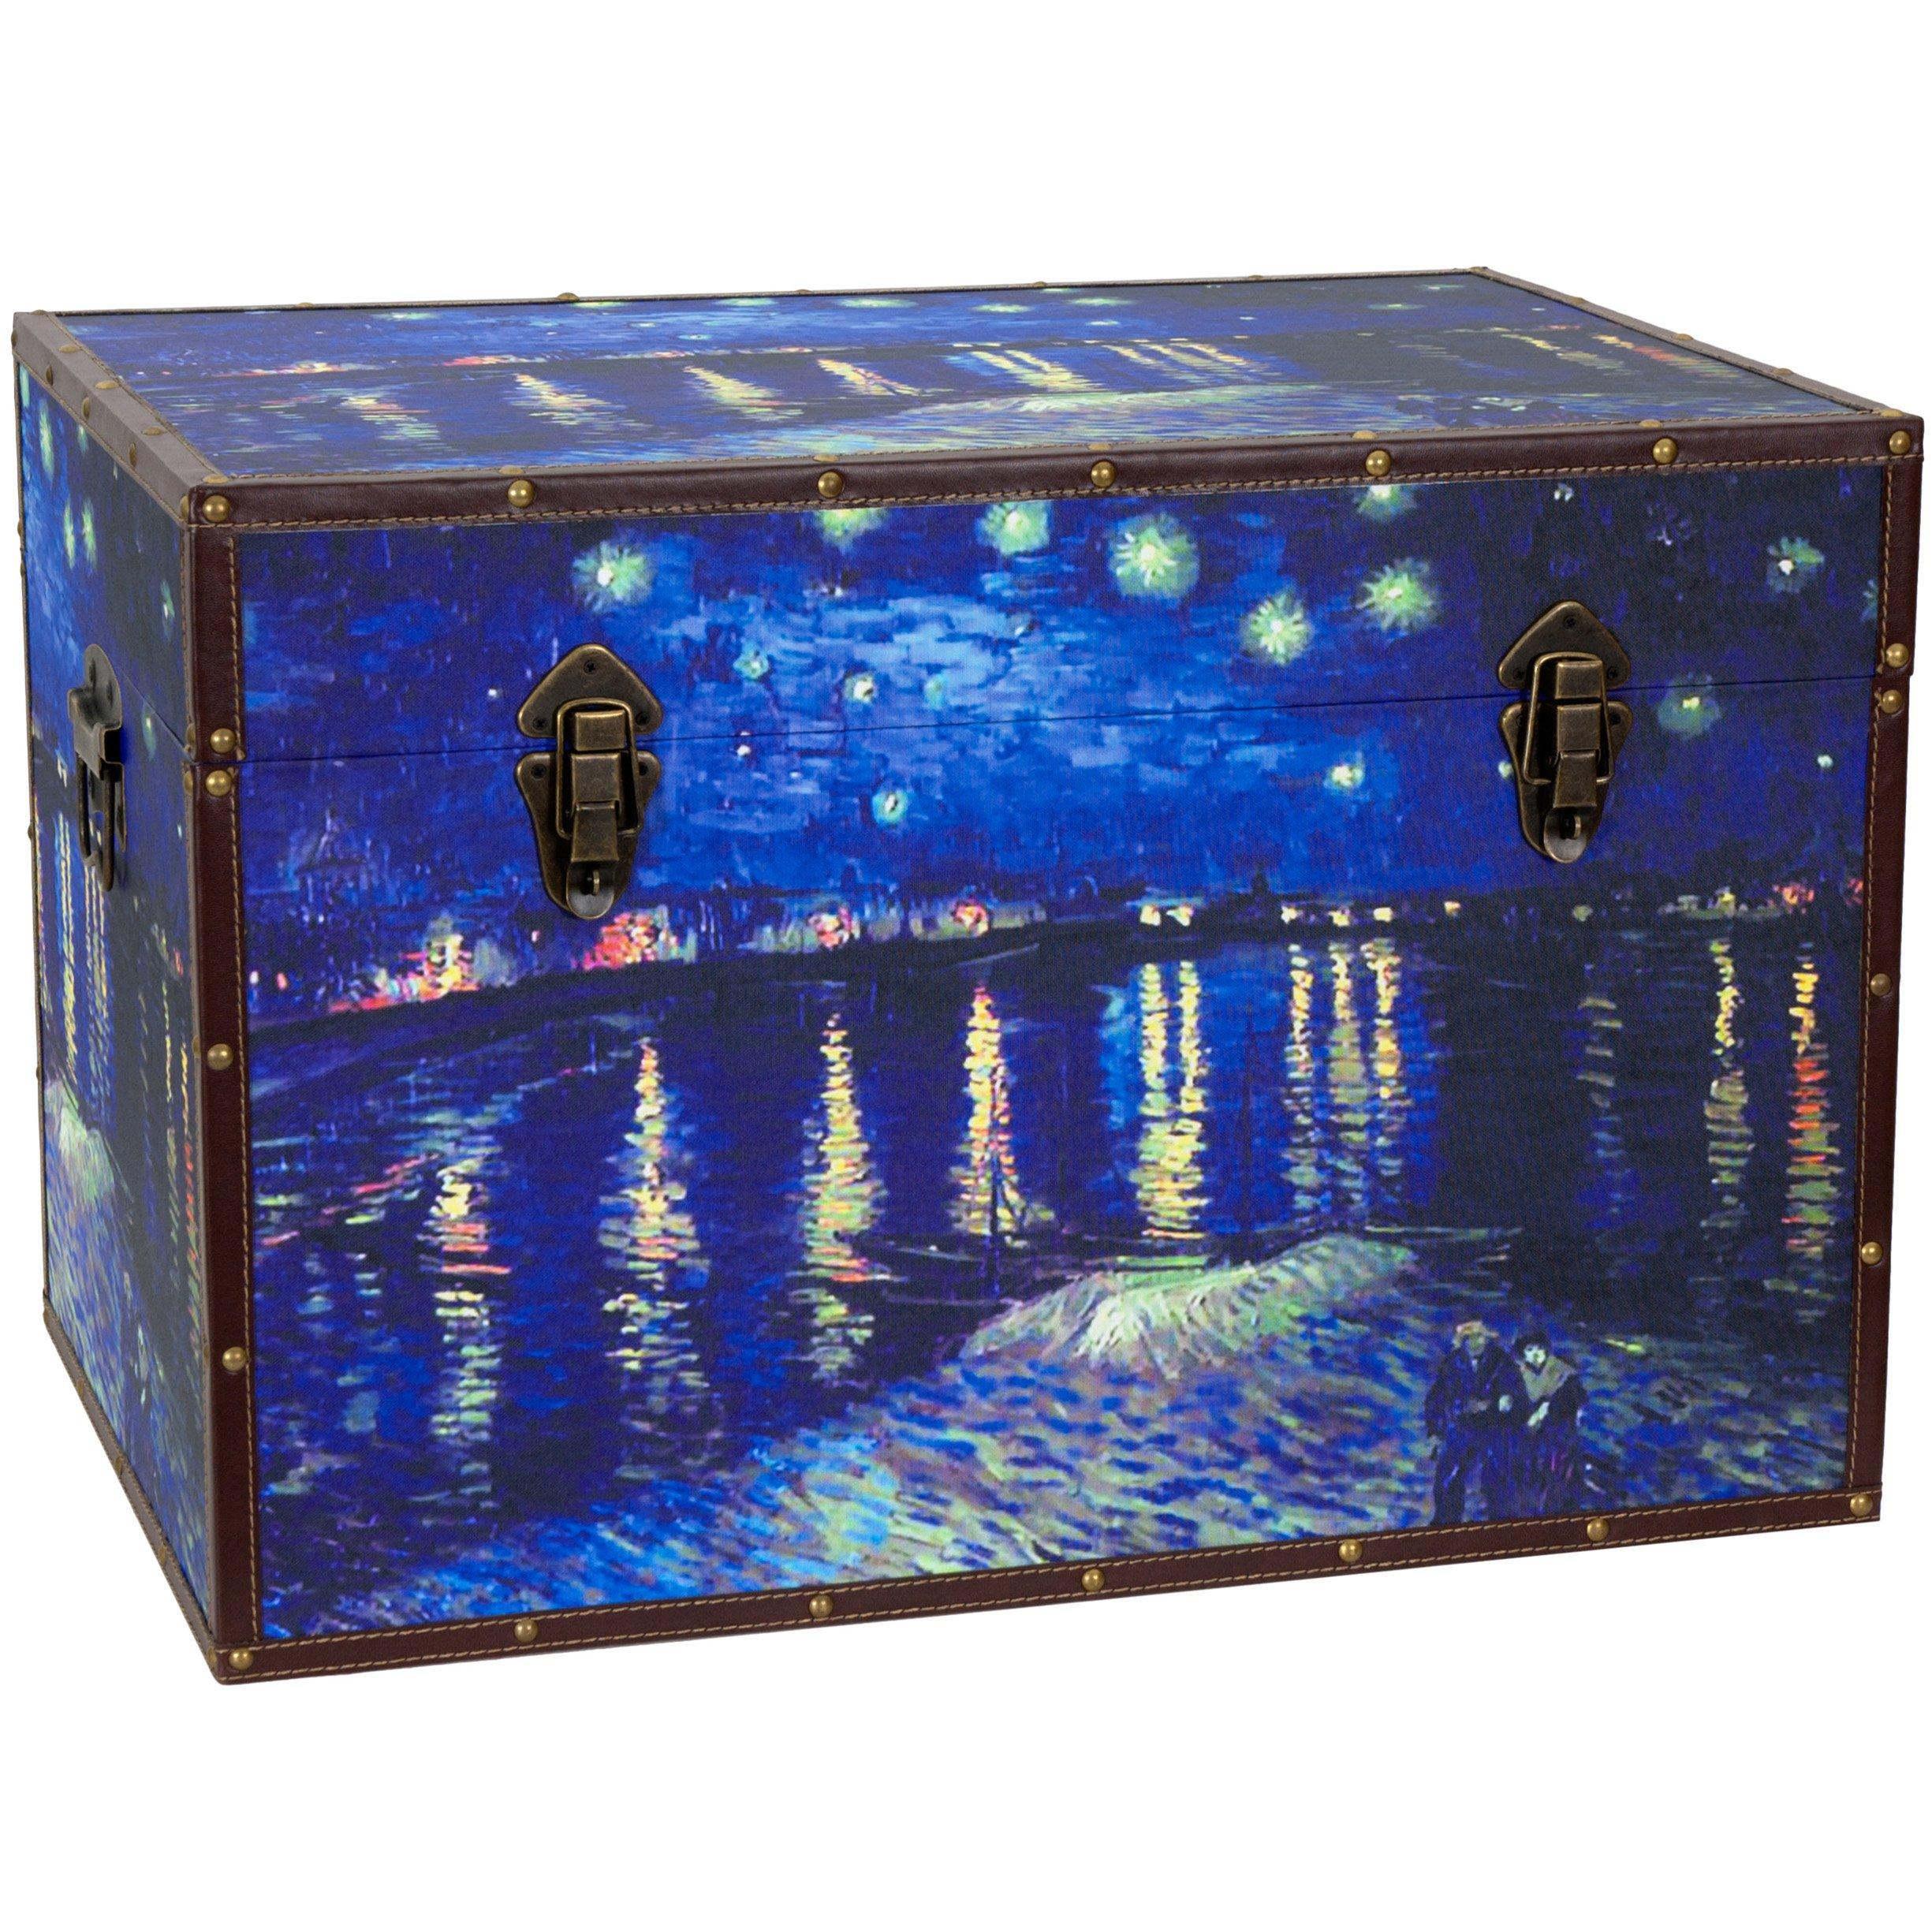 Oriental Furniture Van Gogh's Starry Night Over the Rhone Trunk